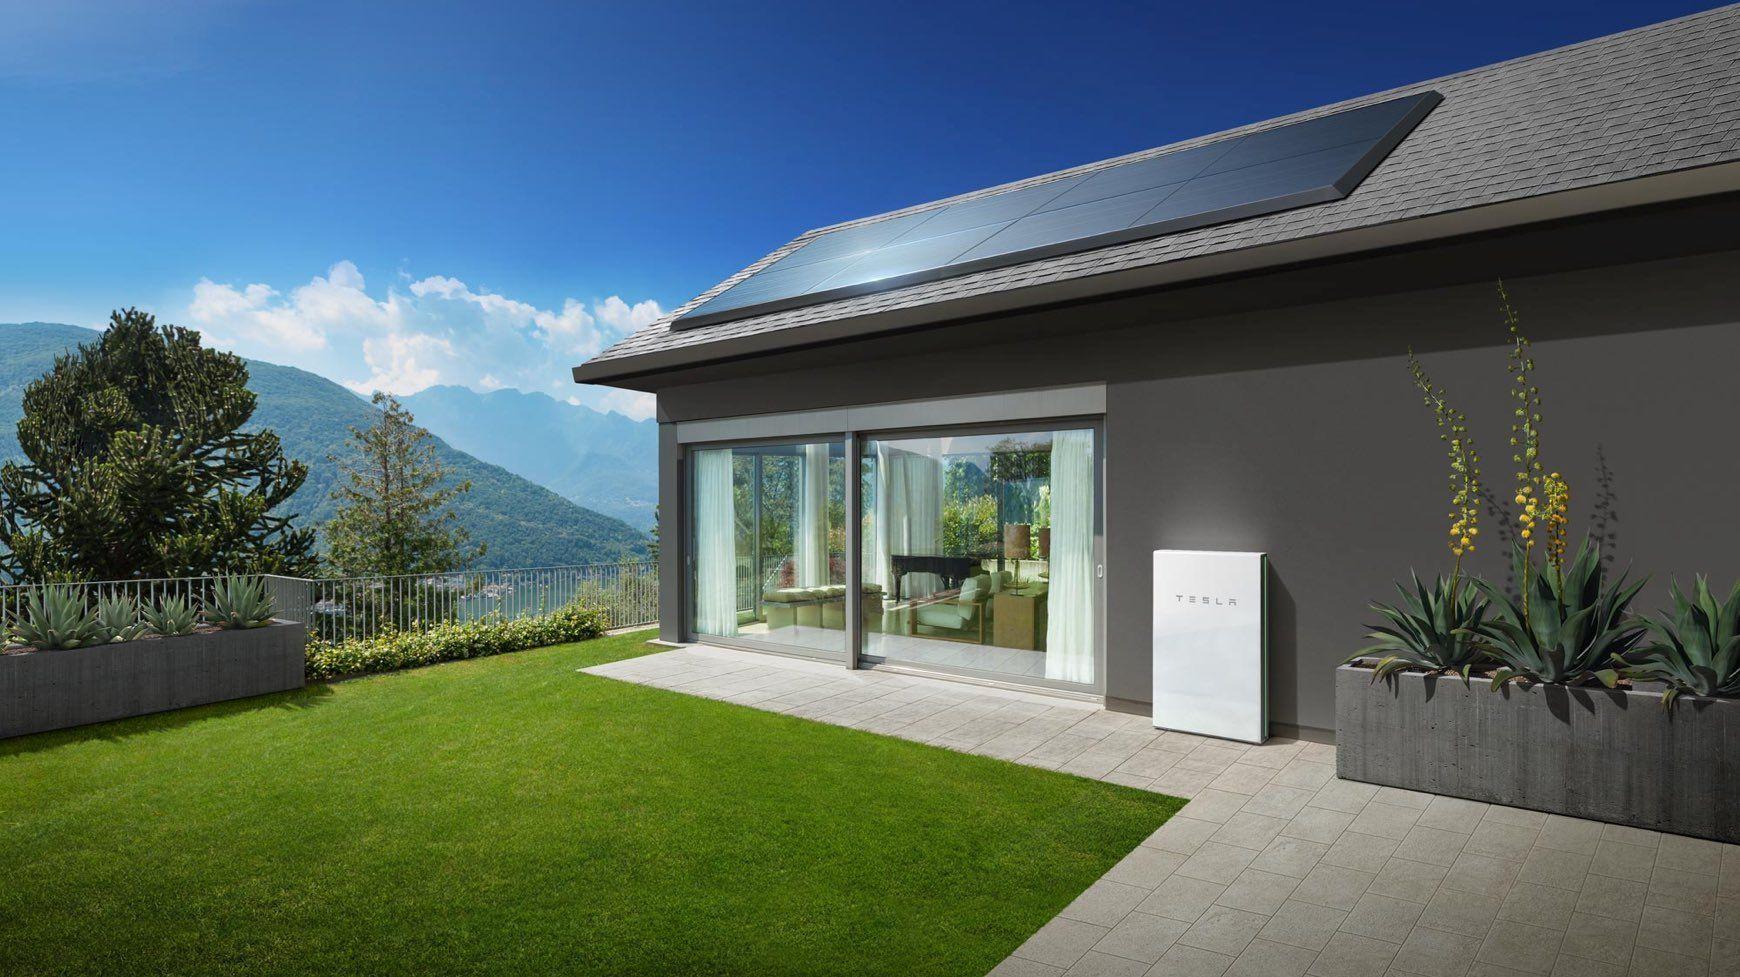 Overview Tesla With Images Powerwall Solar Panels Tesla Powerwall